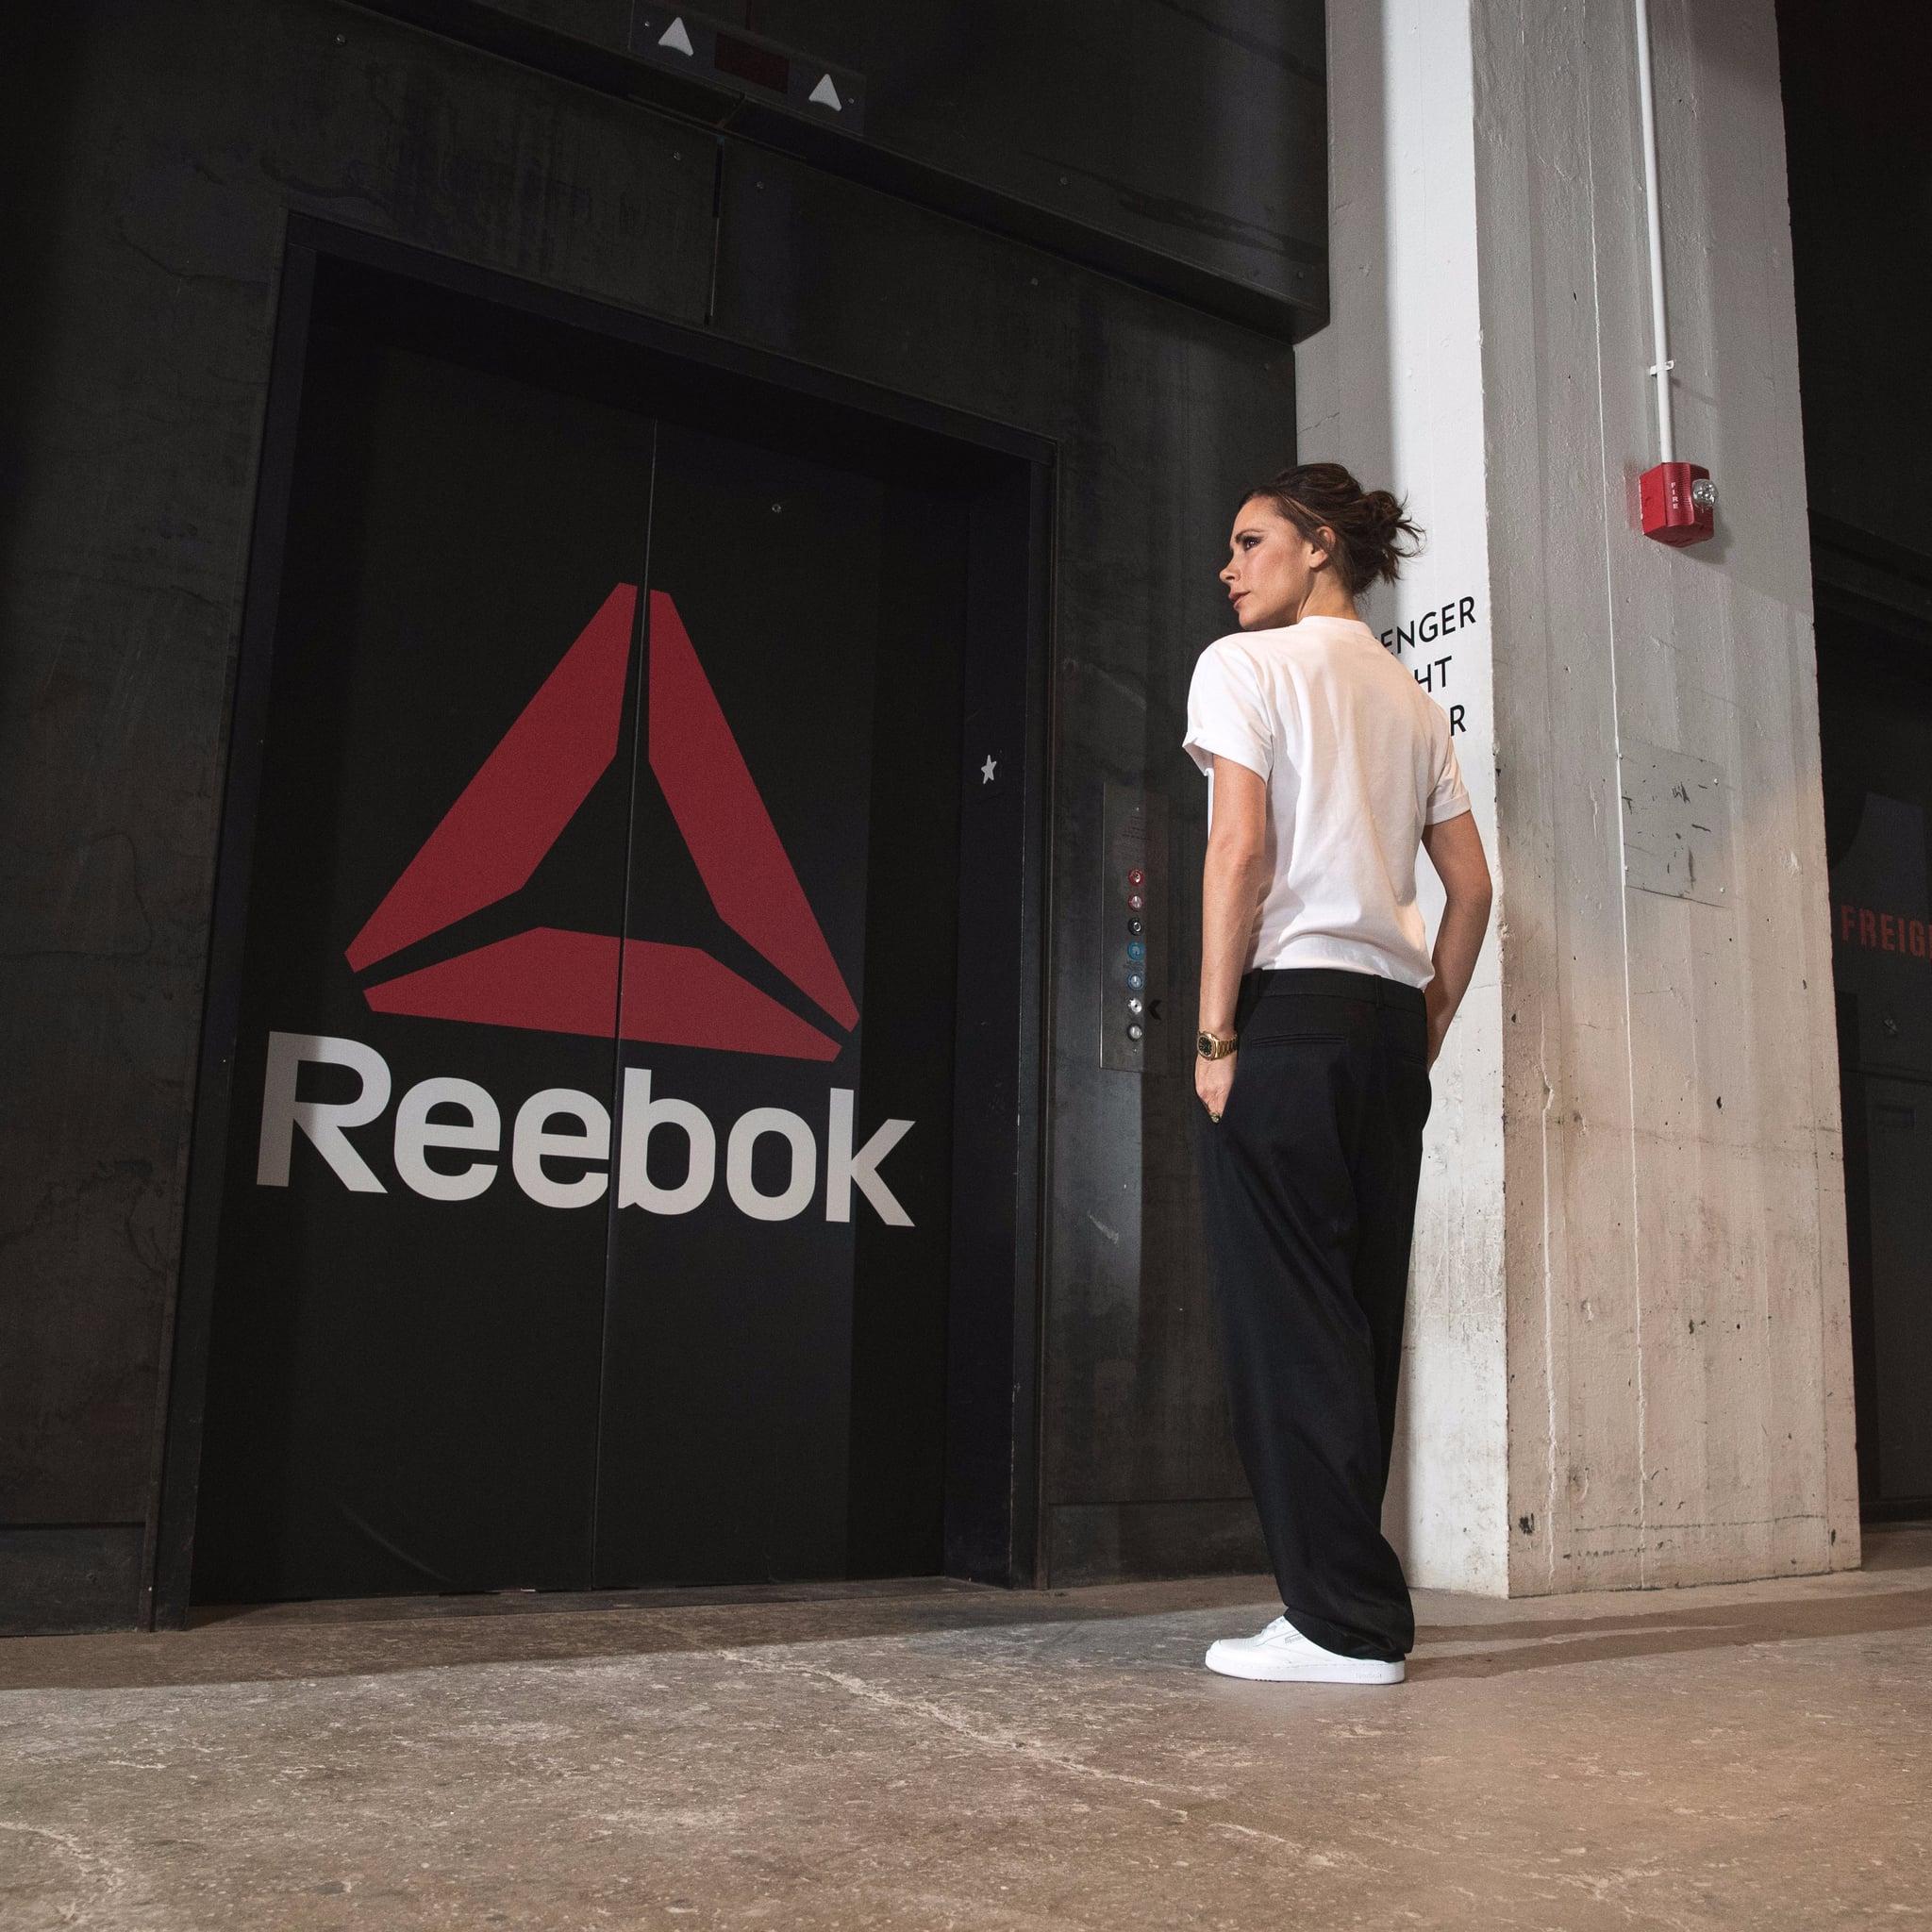 937bac07ca Victoria Beckham Reebok Collaboration | POPSUGAR Fashion